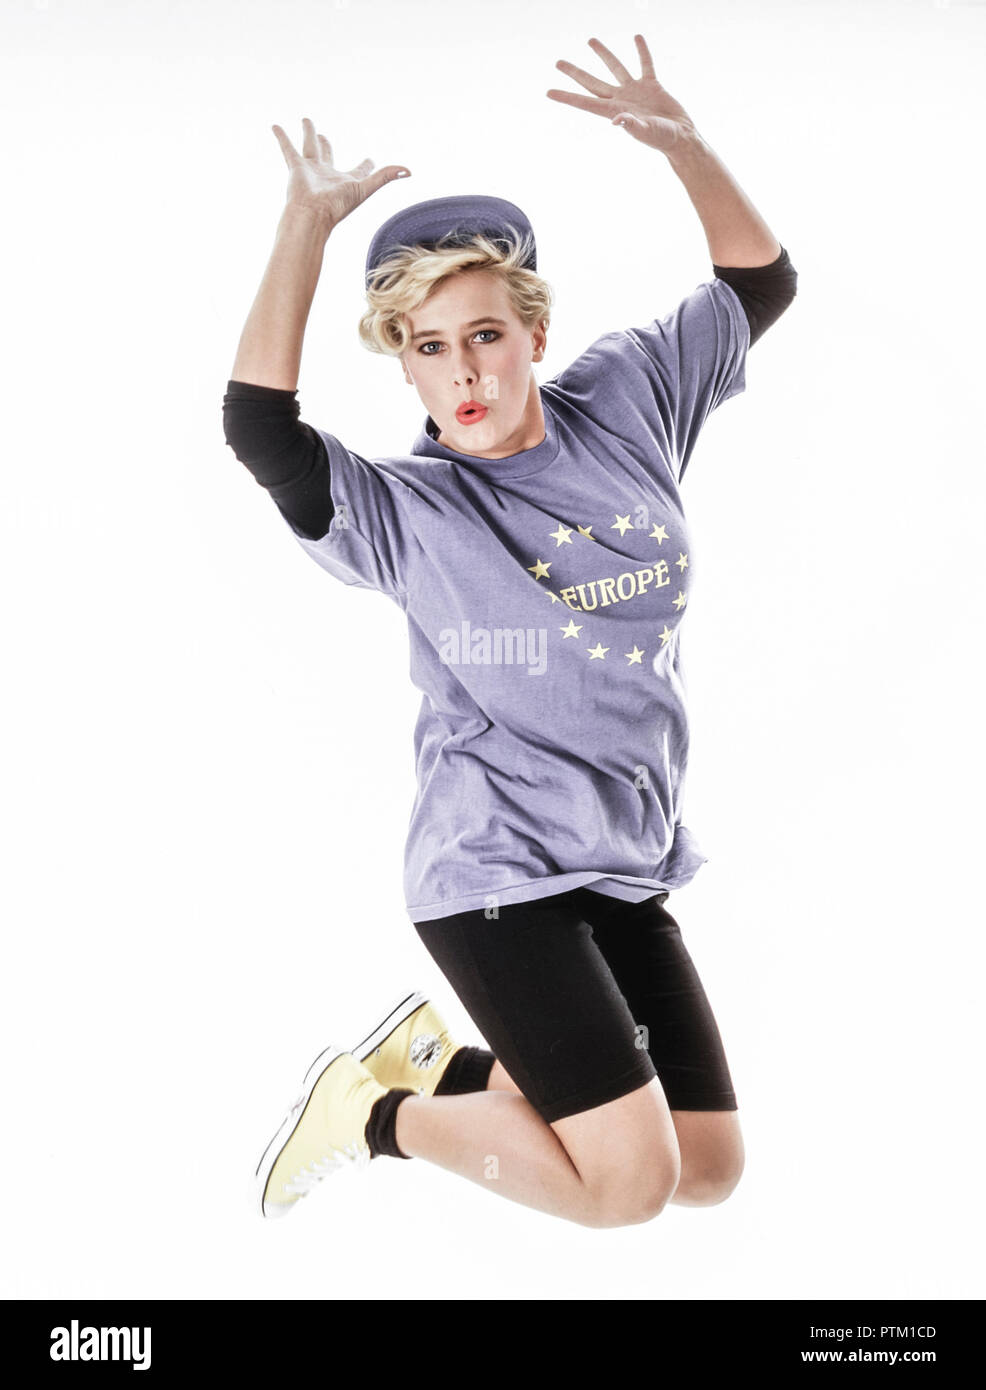 Frau in EU T-Shirt springt in die Luft, Gestik, Freude, , Europa (Modellfreigabe) - Stock Image